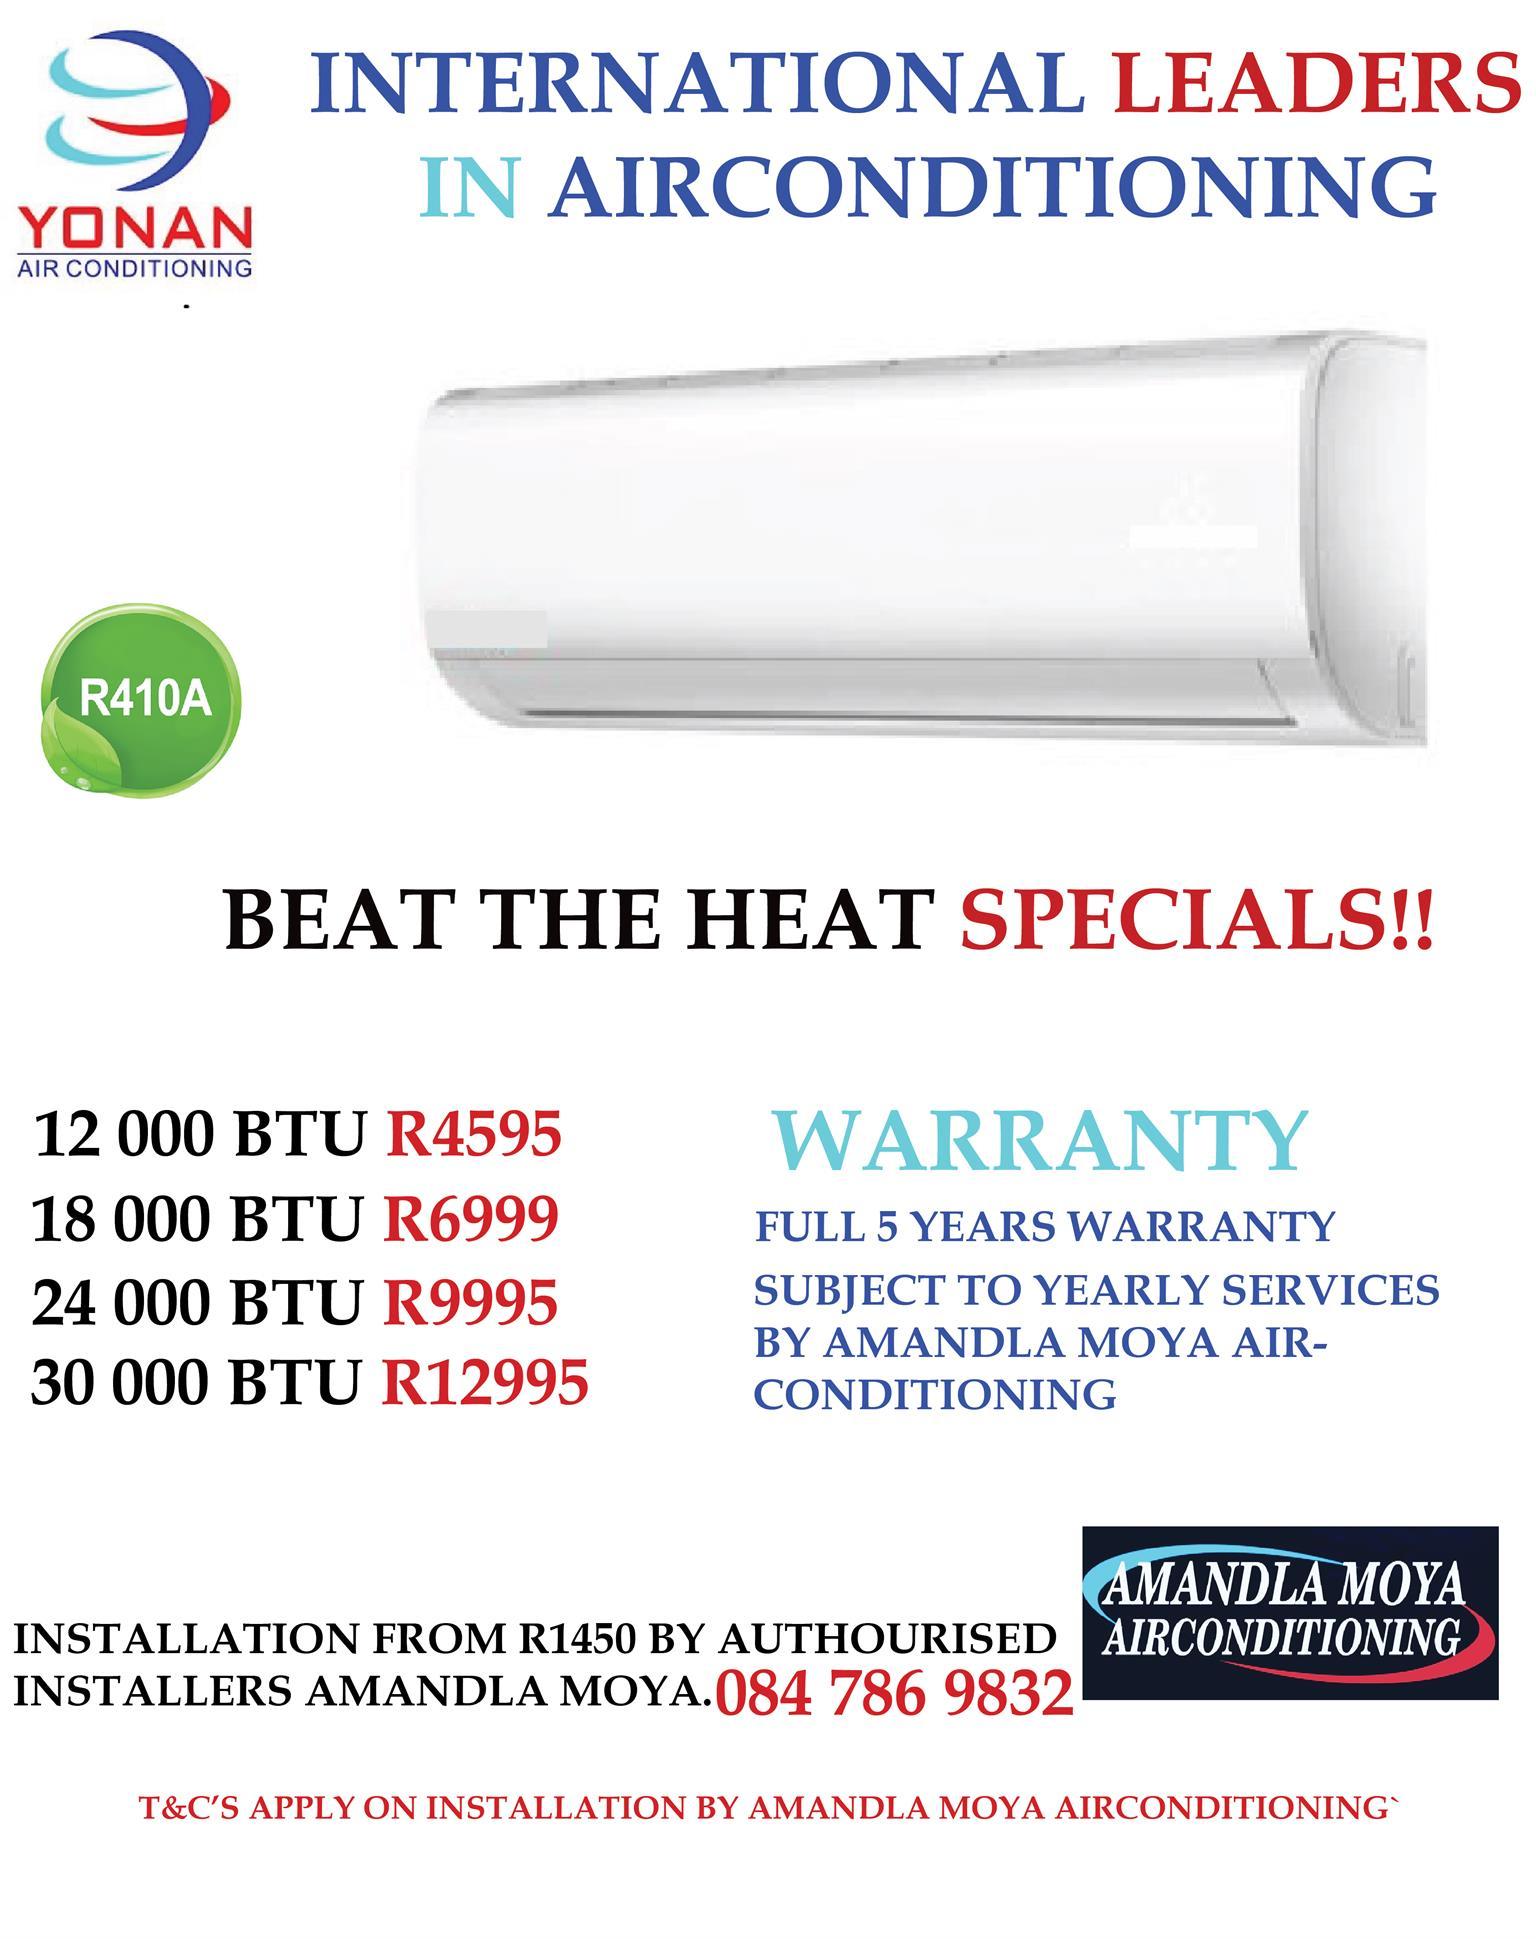 Yonan Air Conditioners